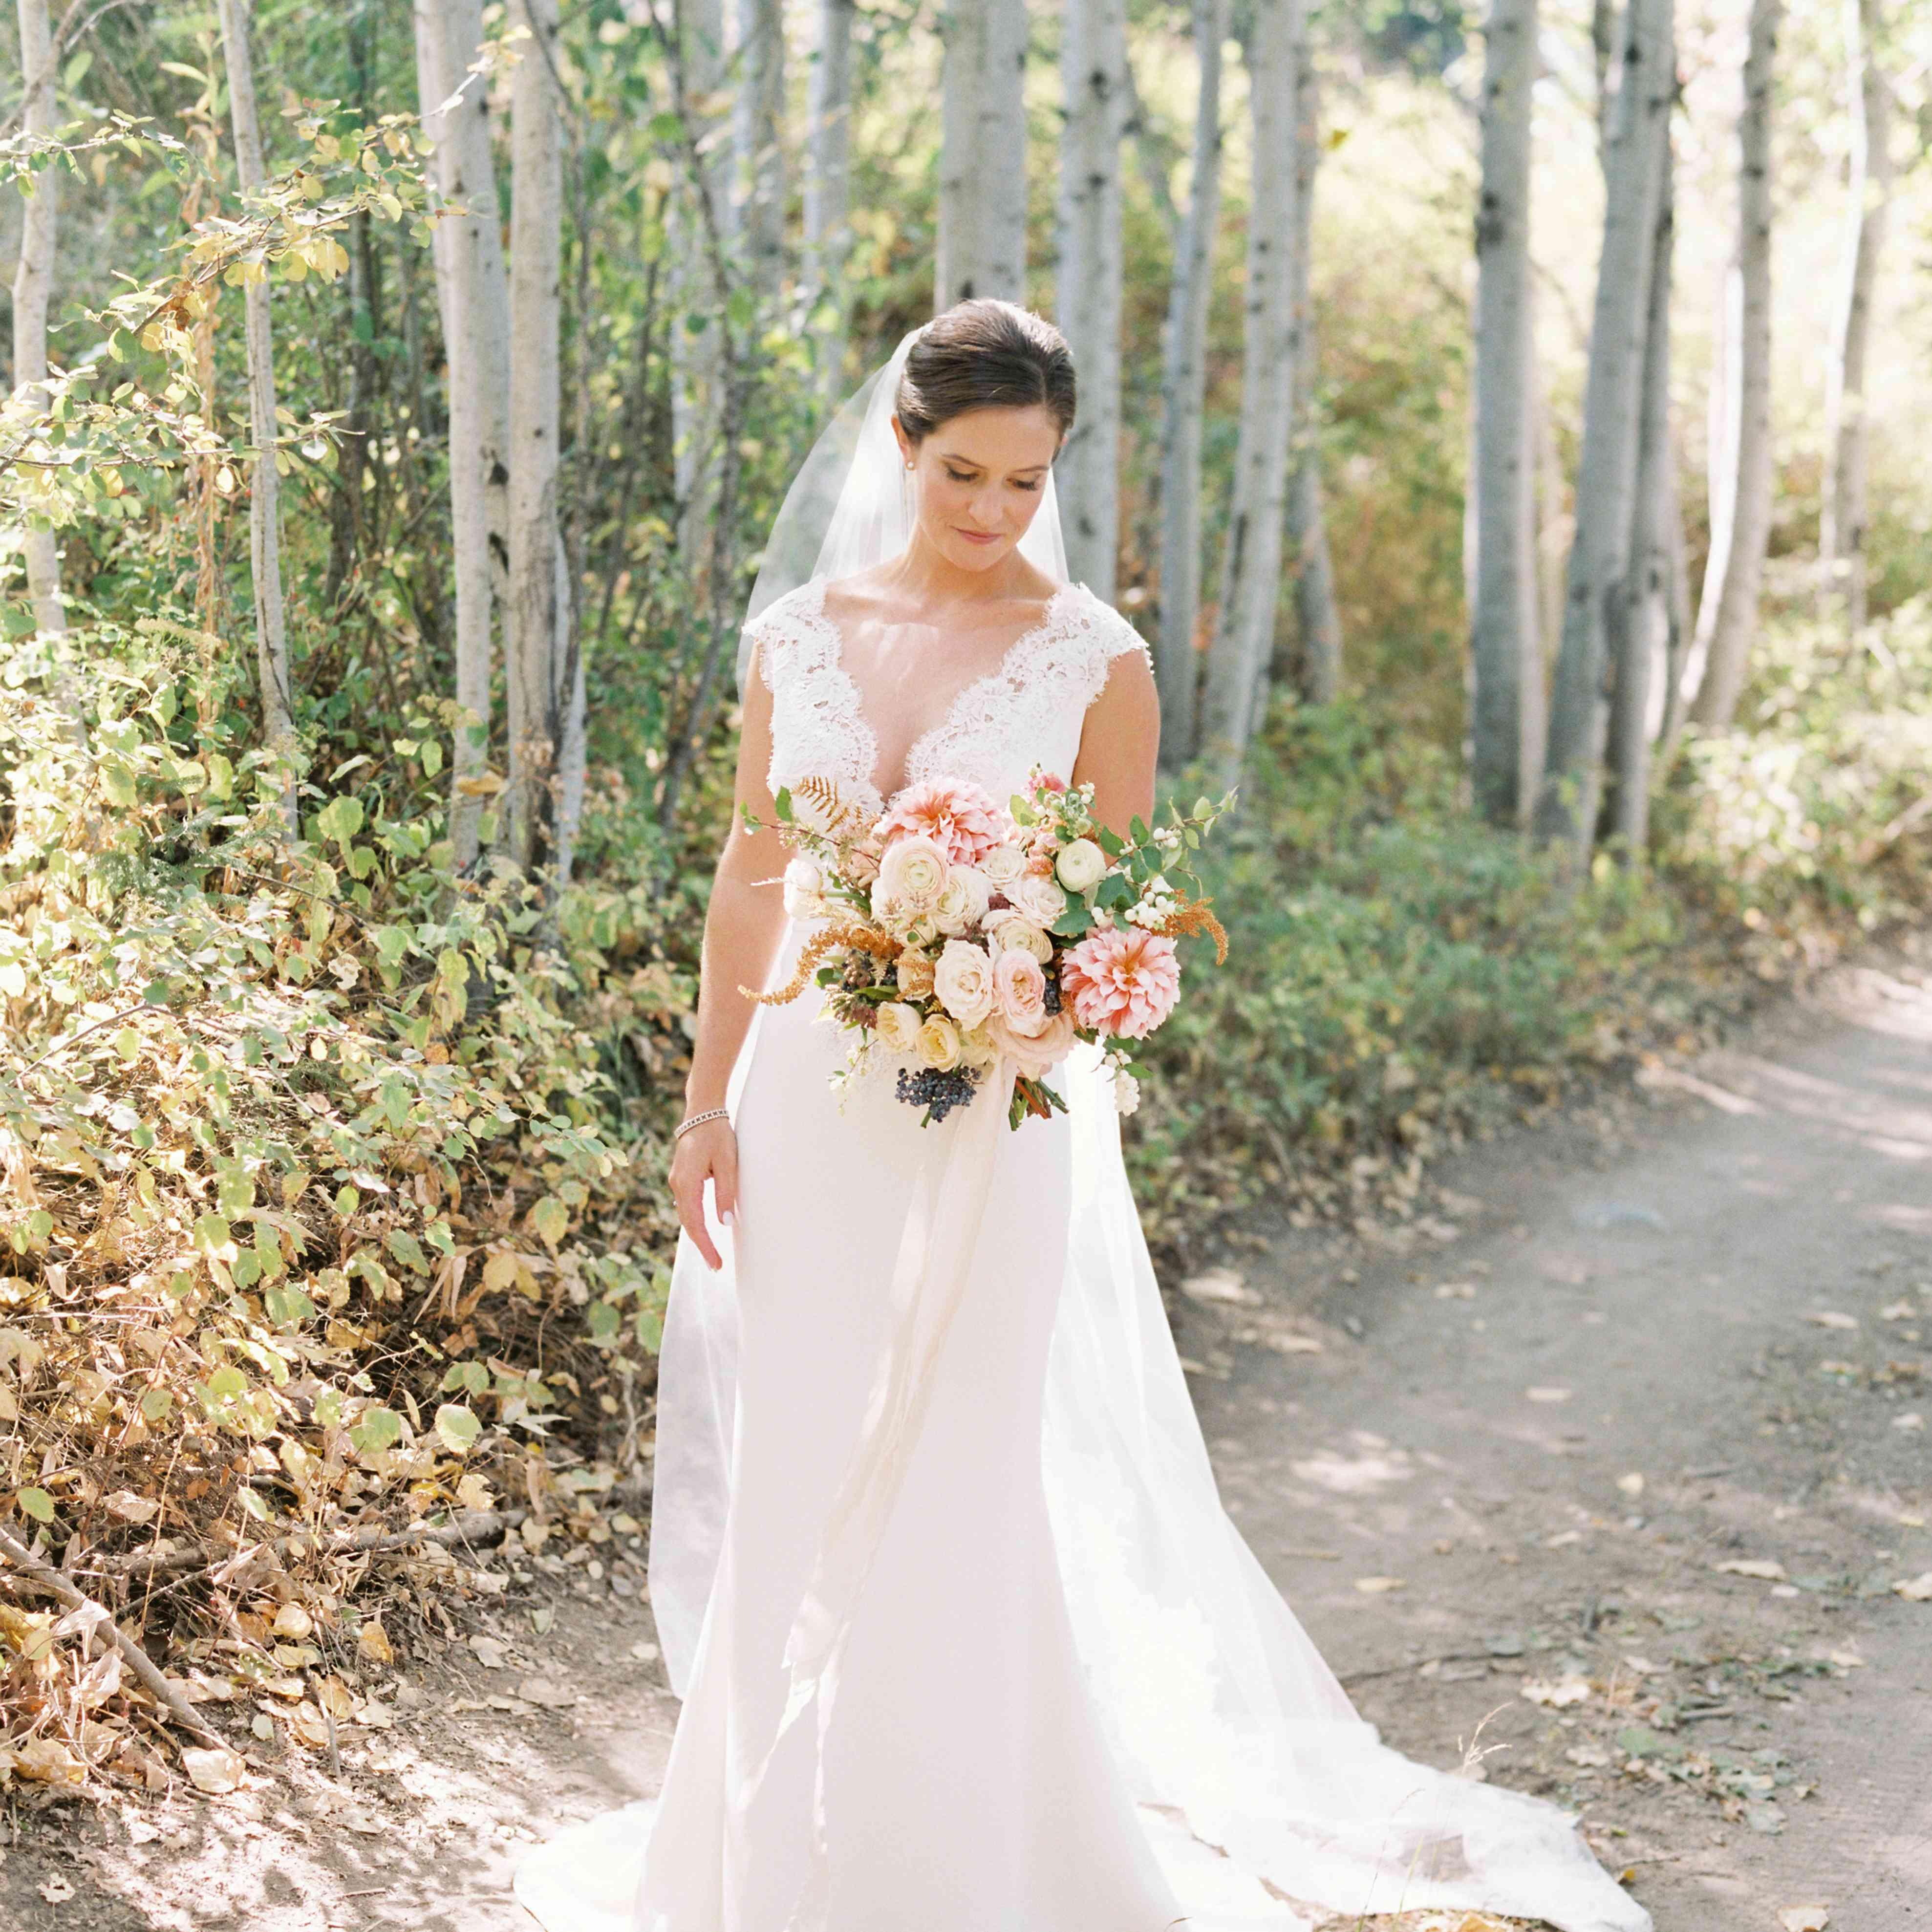 Bride outdoor wilderness setting